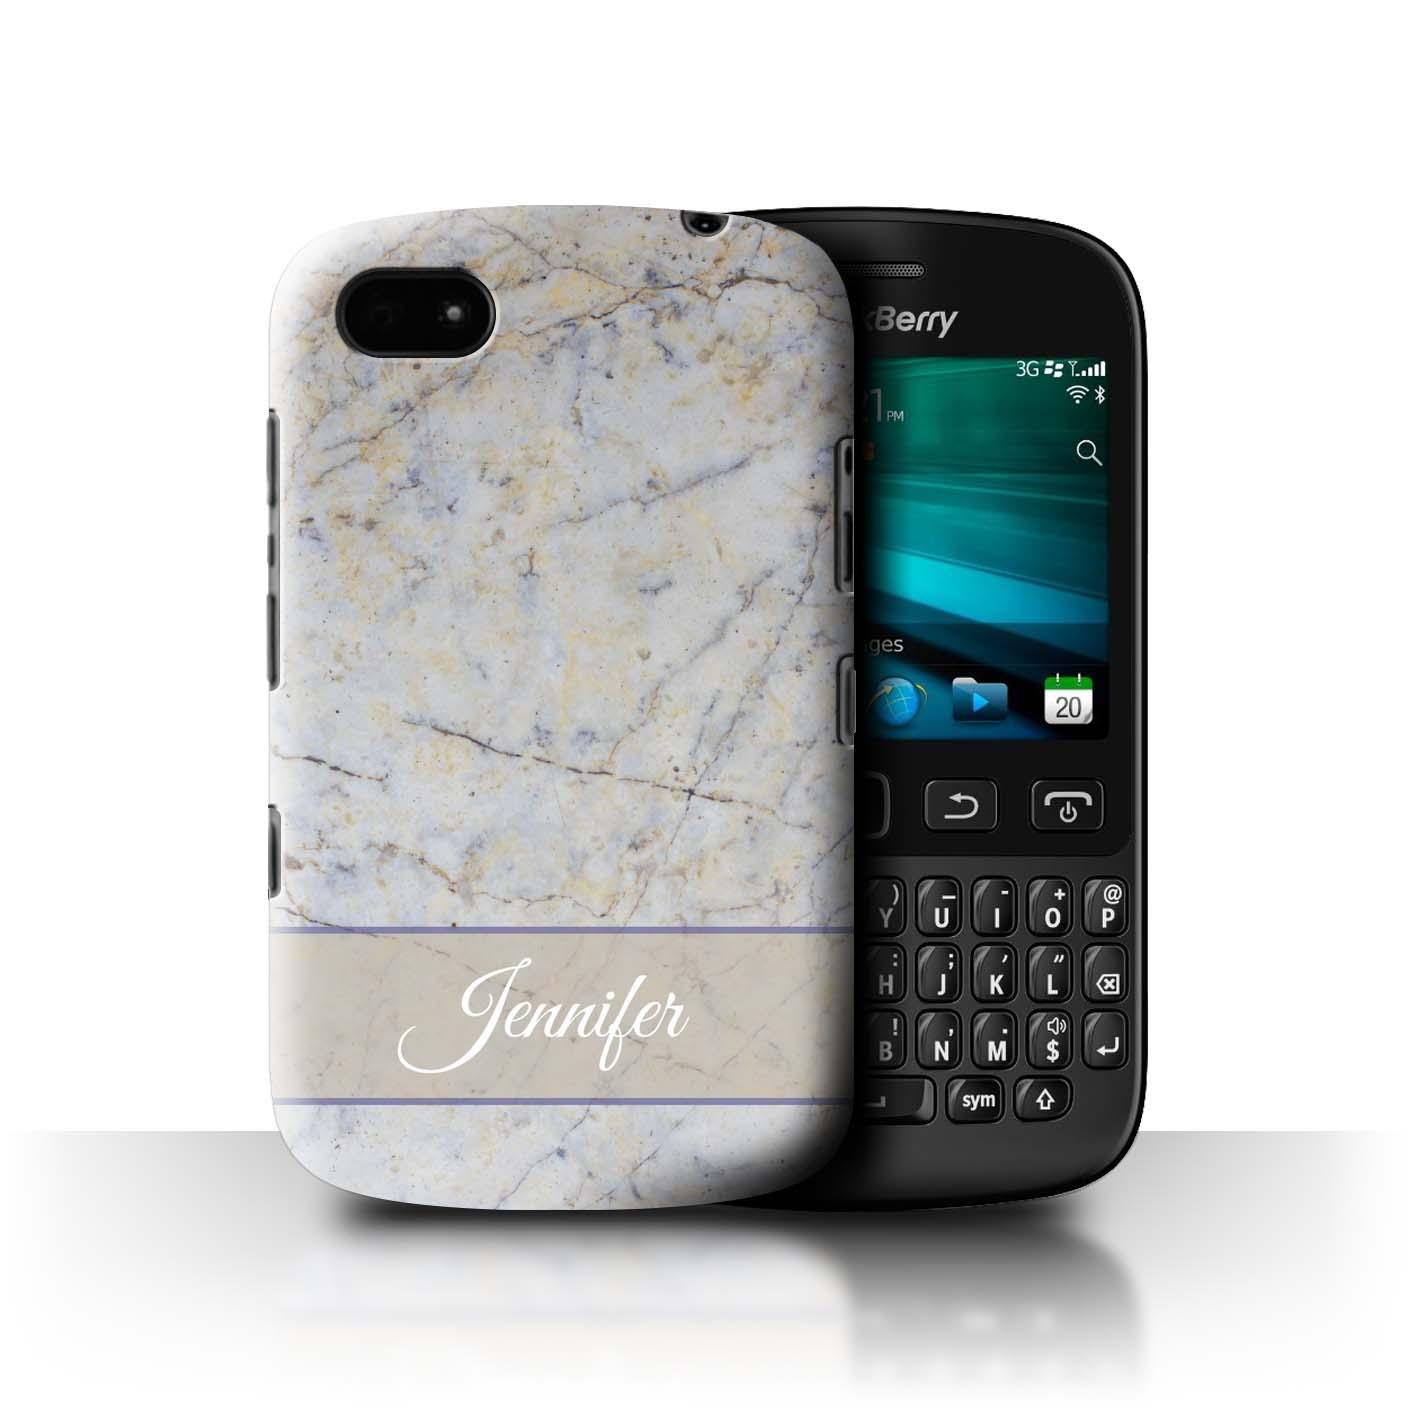 Personnalise-Marbre-Coque-Etui-pour-Blackberry-Telephone-Smartphone-Initiale-Nom